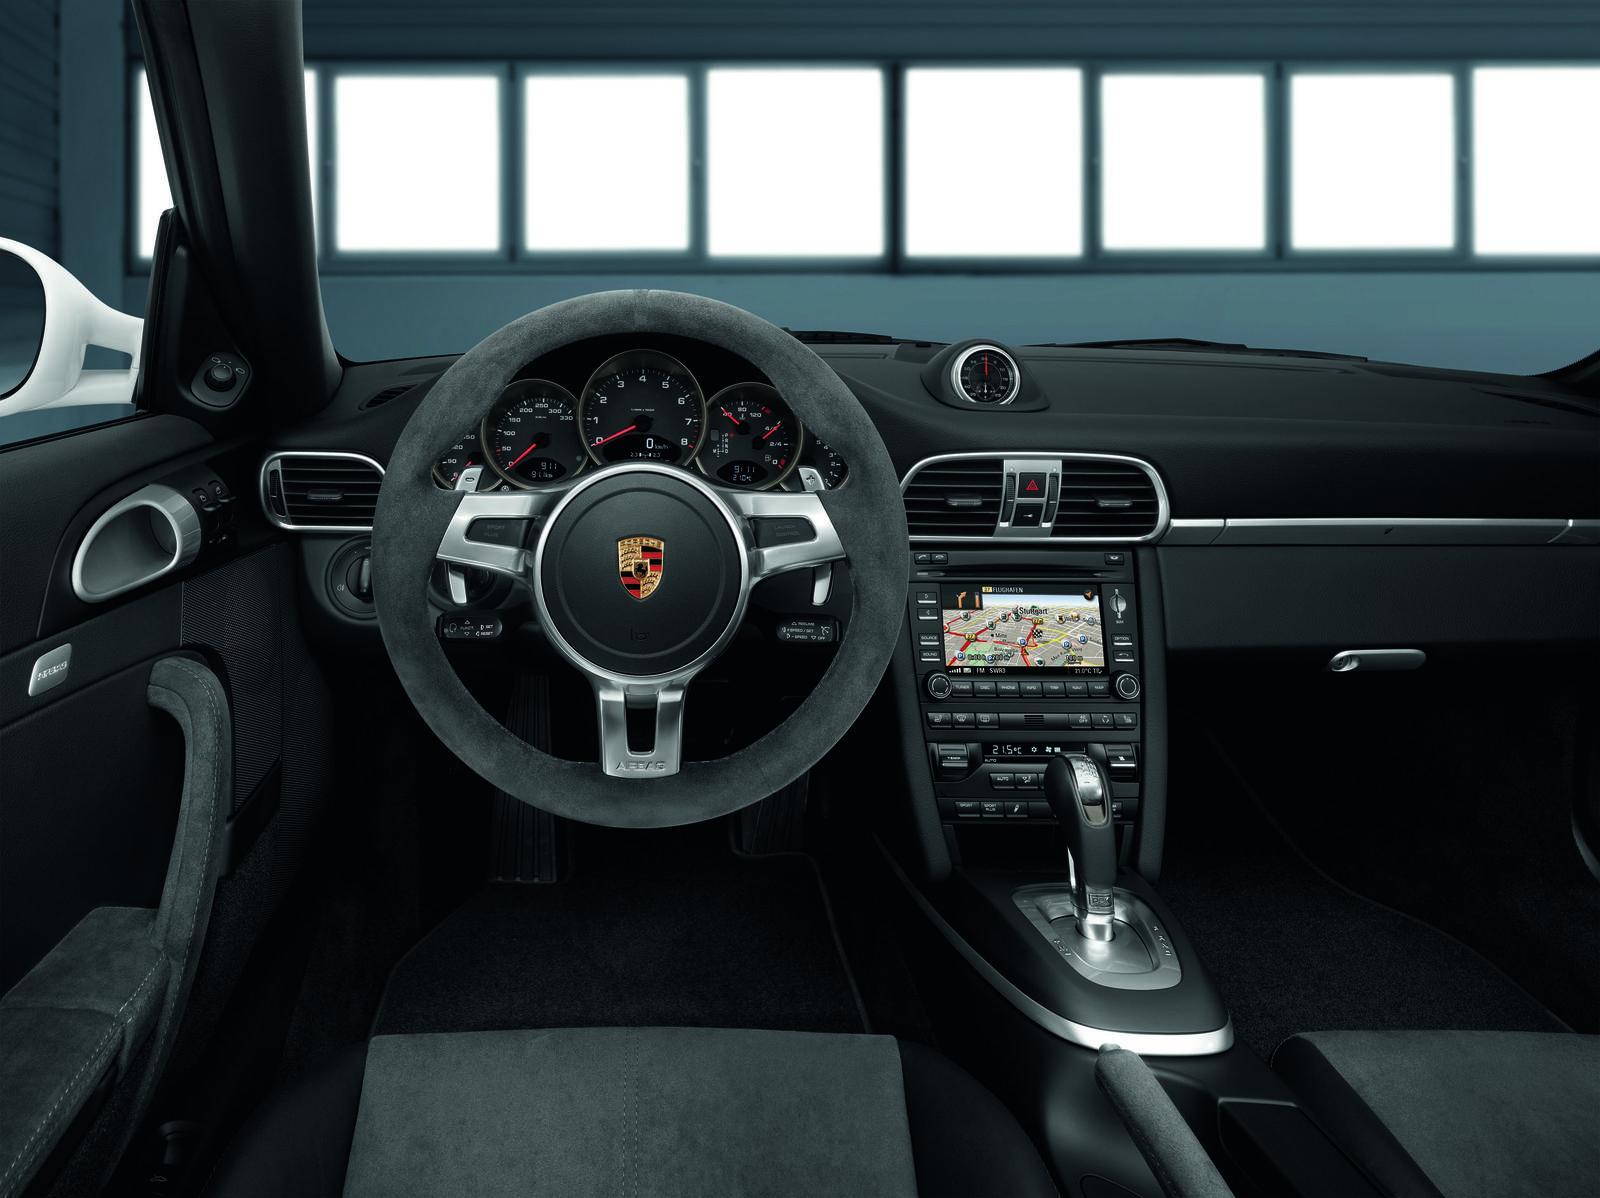 2011 porsche 911 carrera gts review new car used car for Porsche 911 interieur